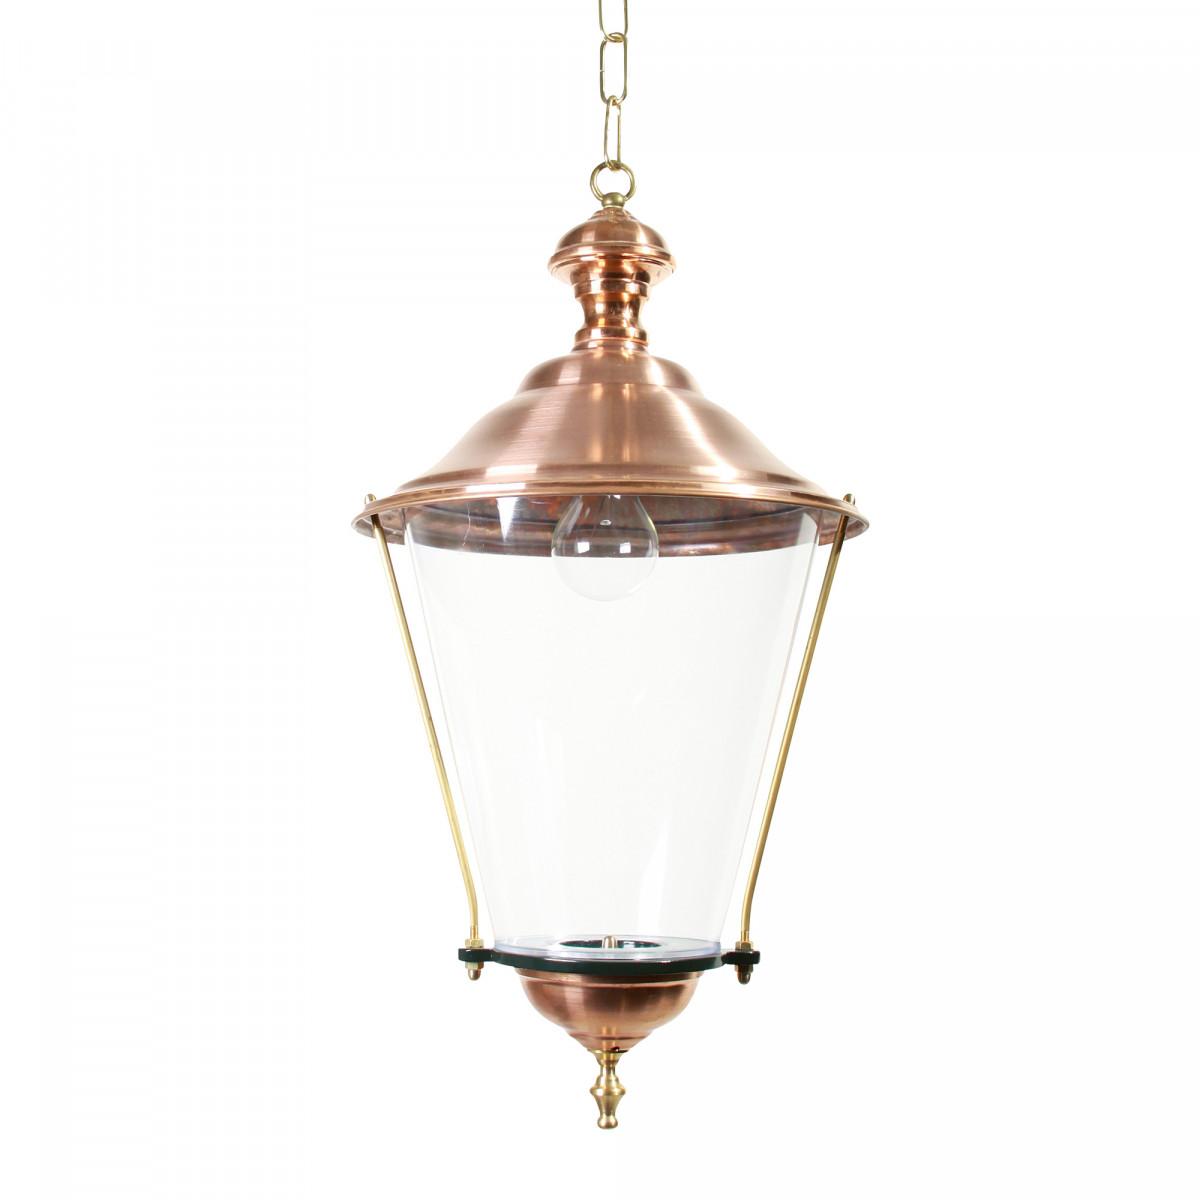 Hanglamp K4B aan ketting